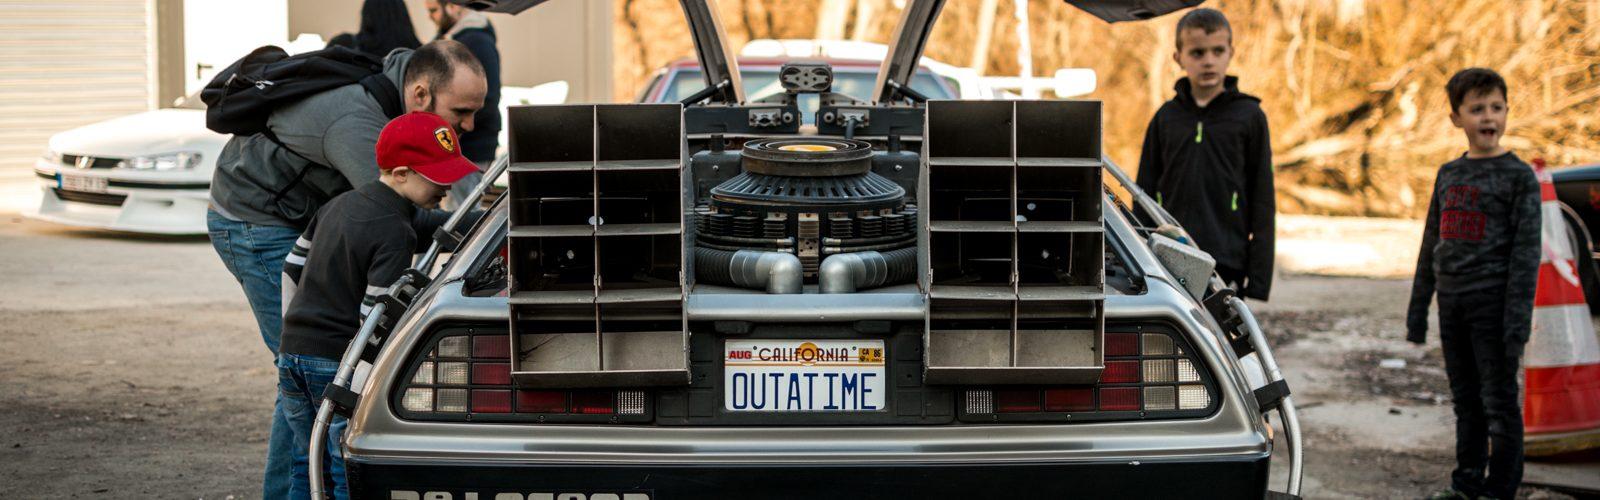 Movie Cars and coffee 2 48